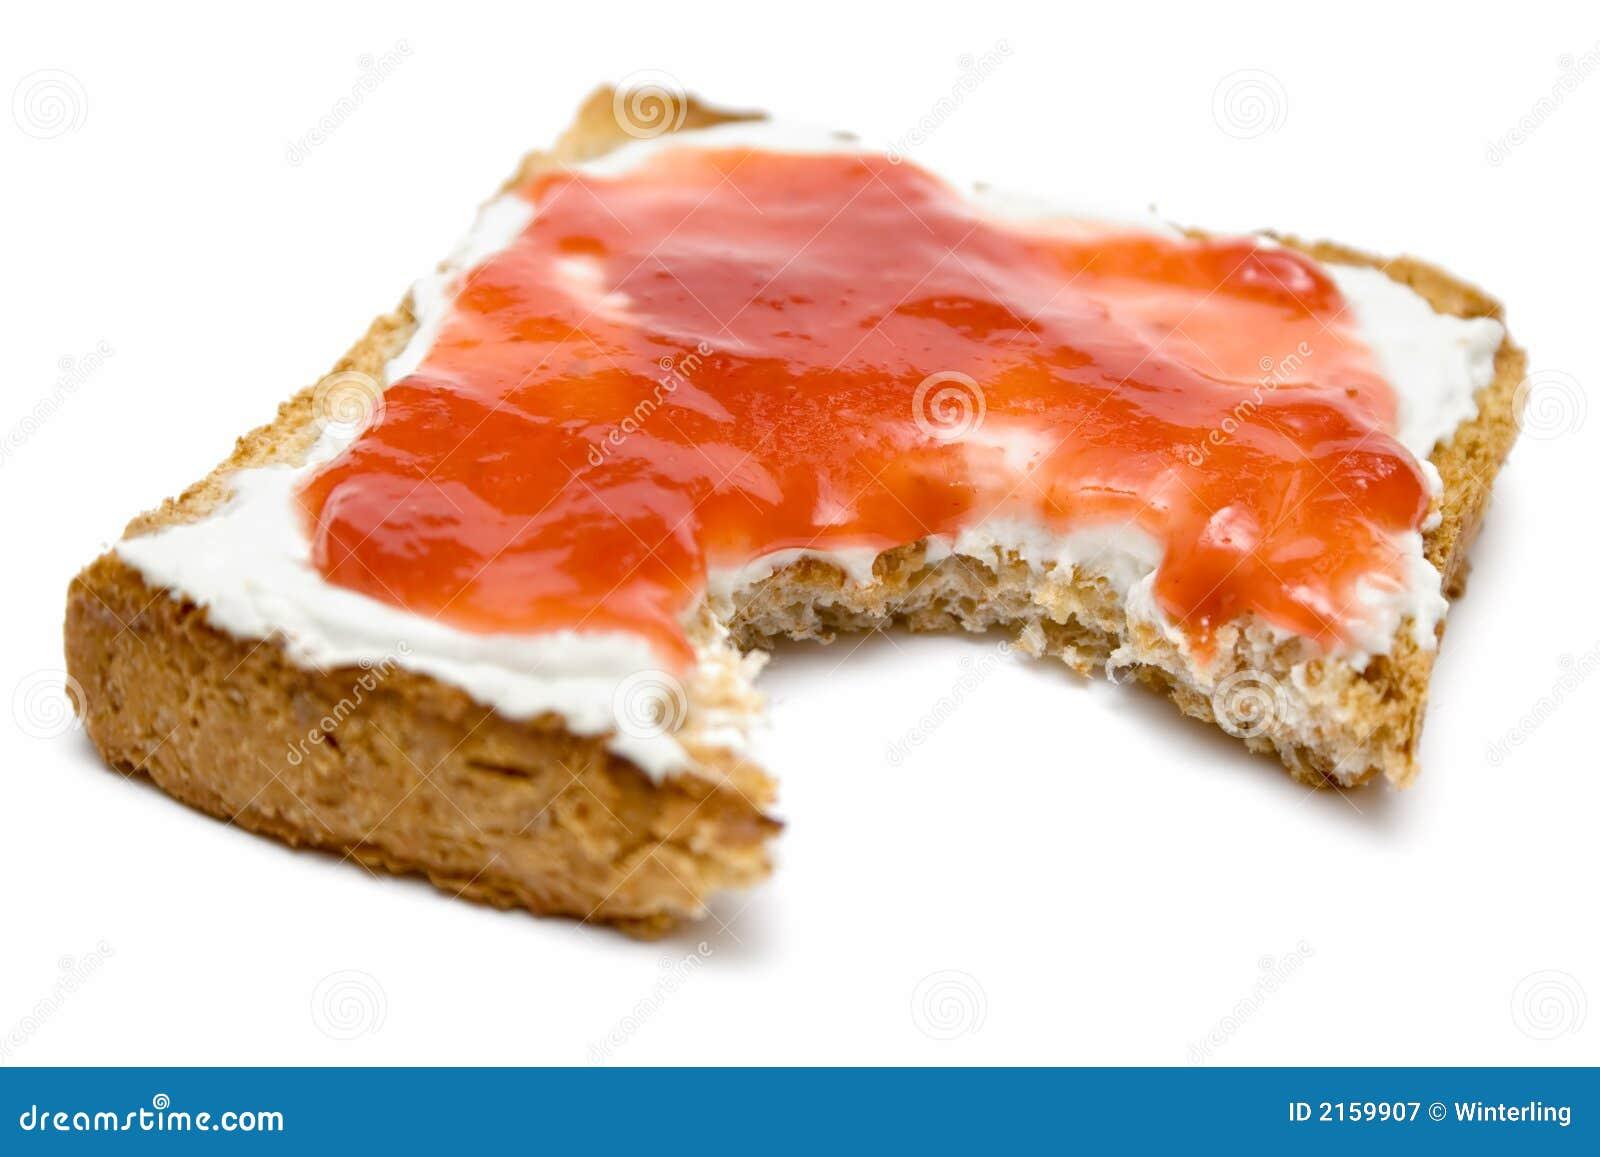 Breakfast Toast with Jam